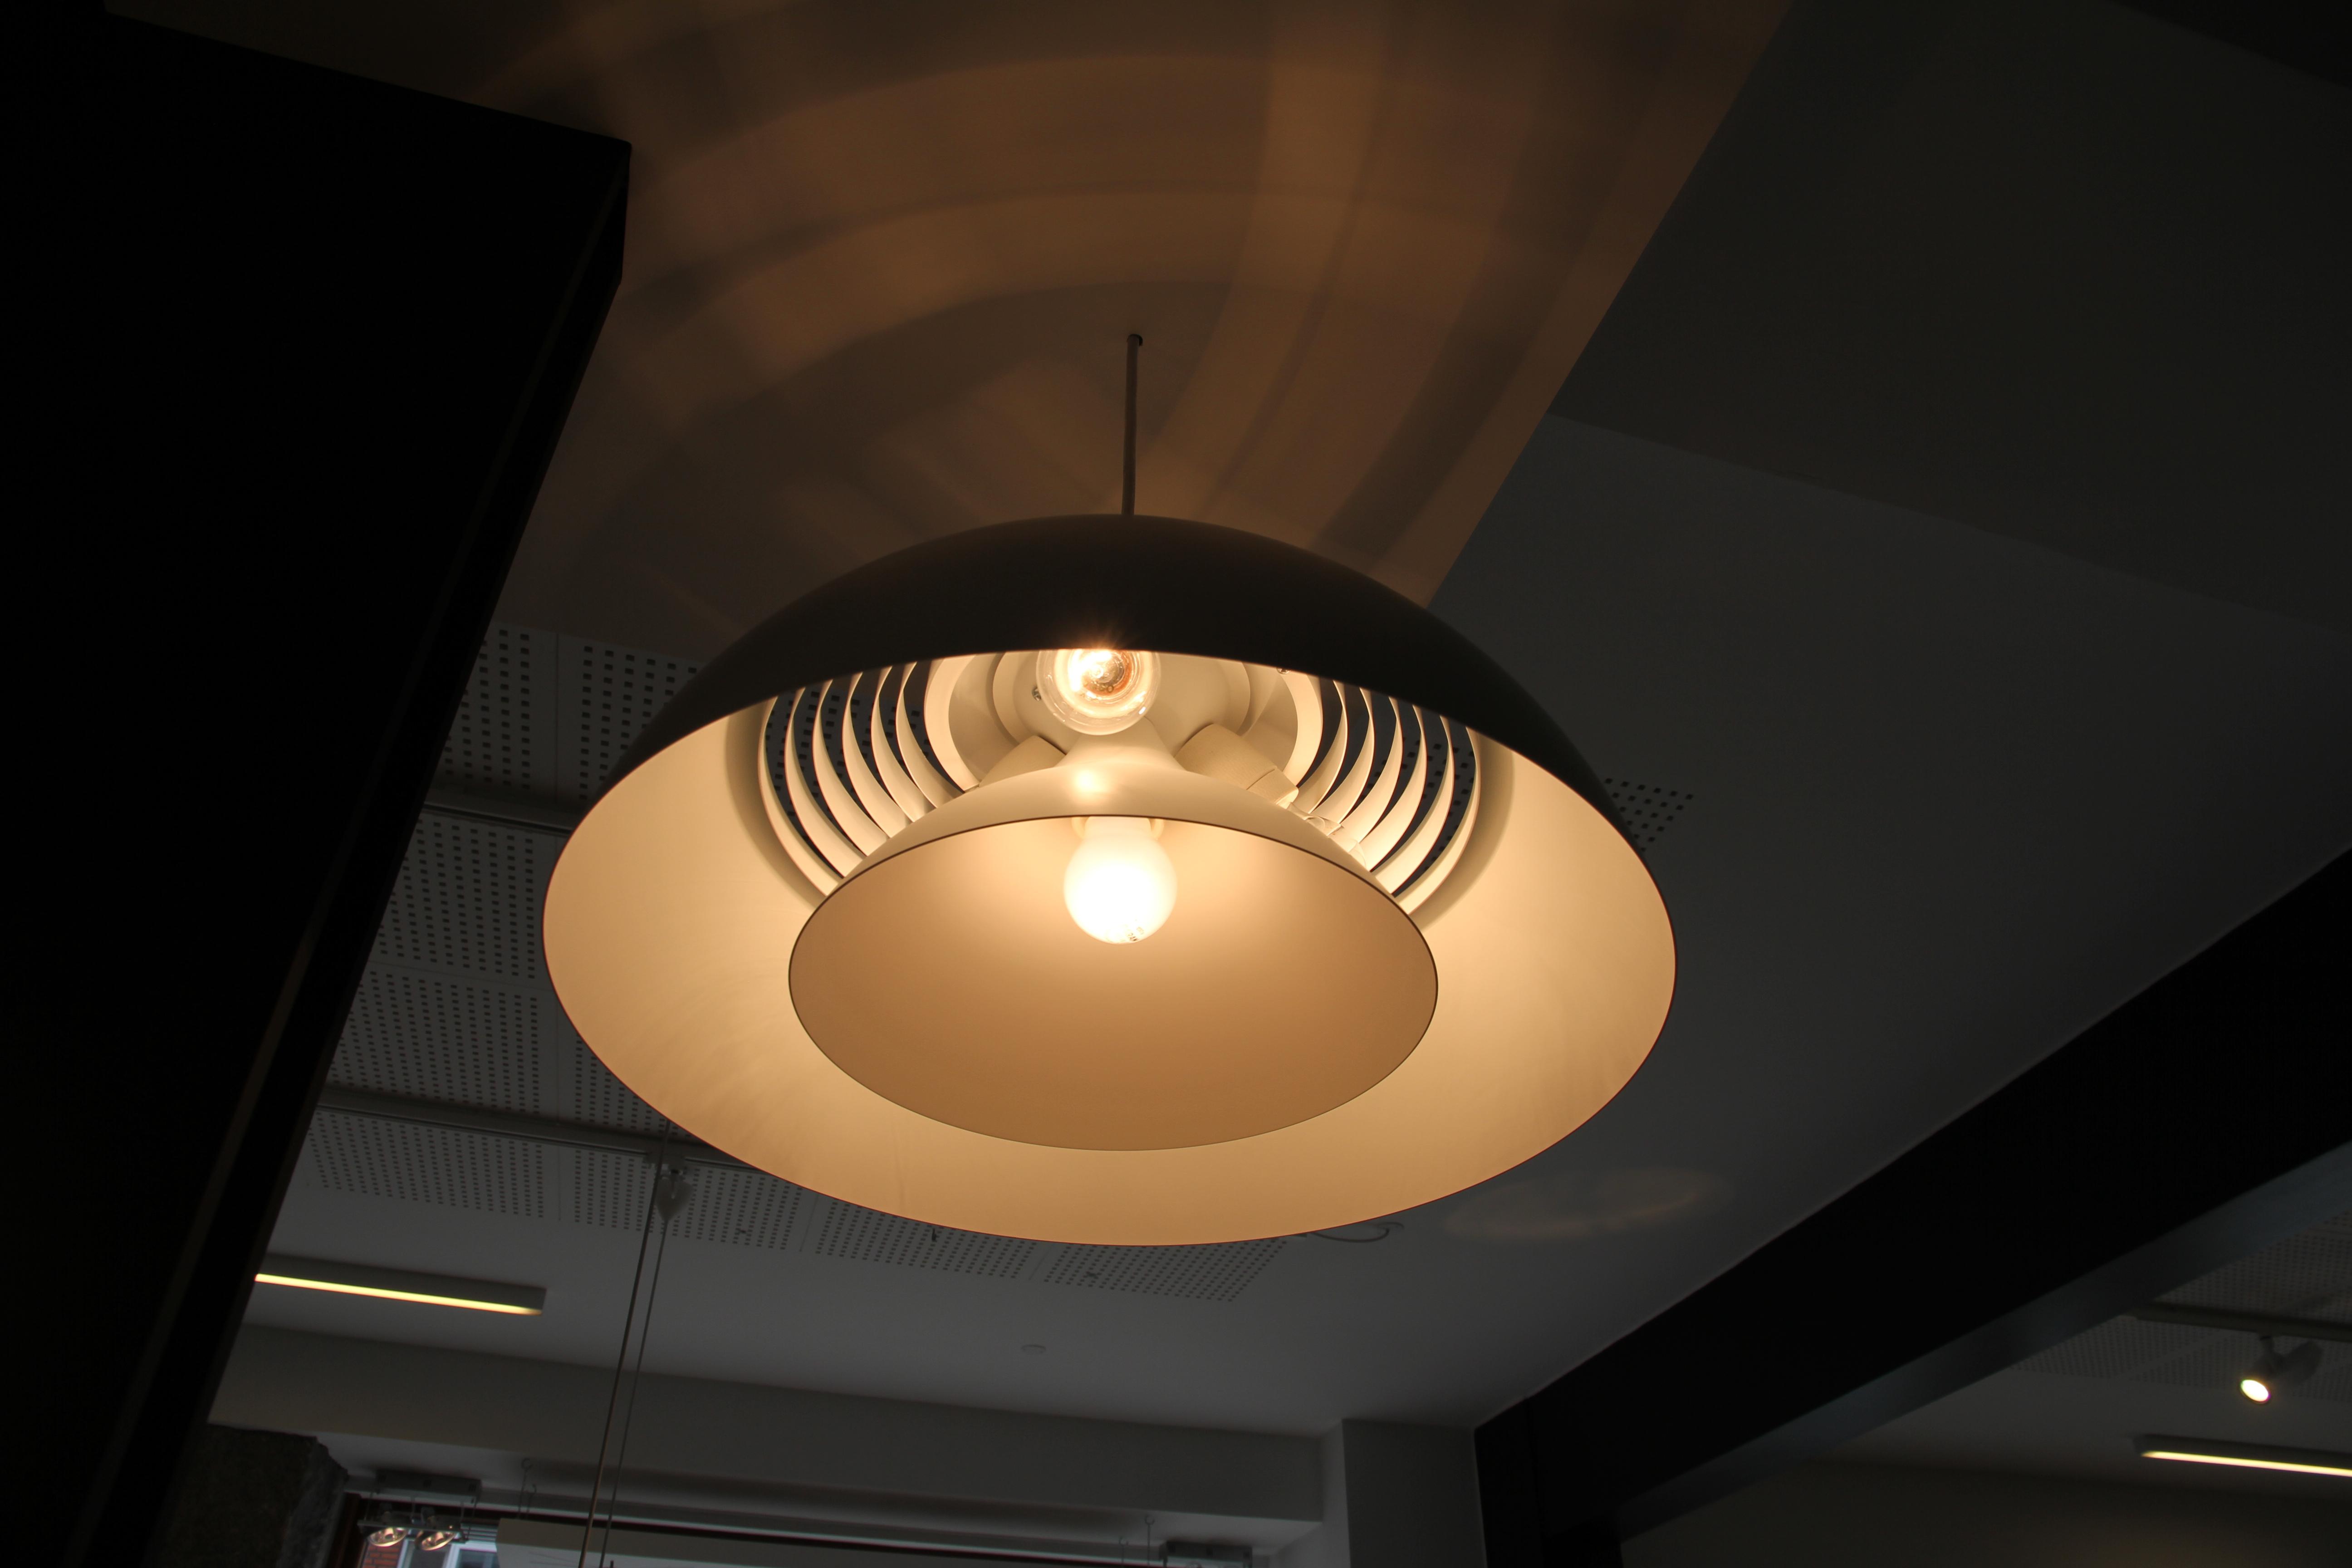 File:Design lampe.JPG - Wikimedia Commons